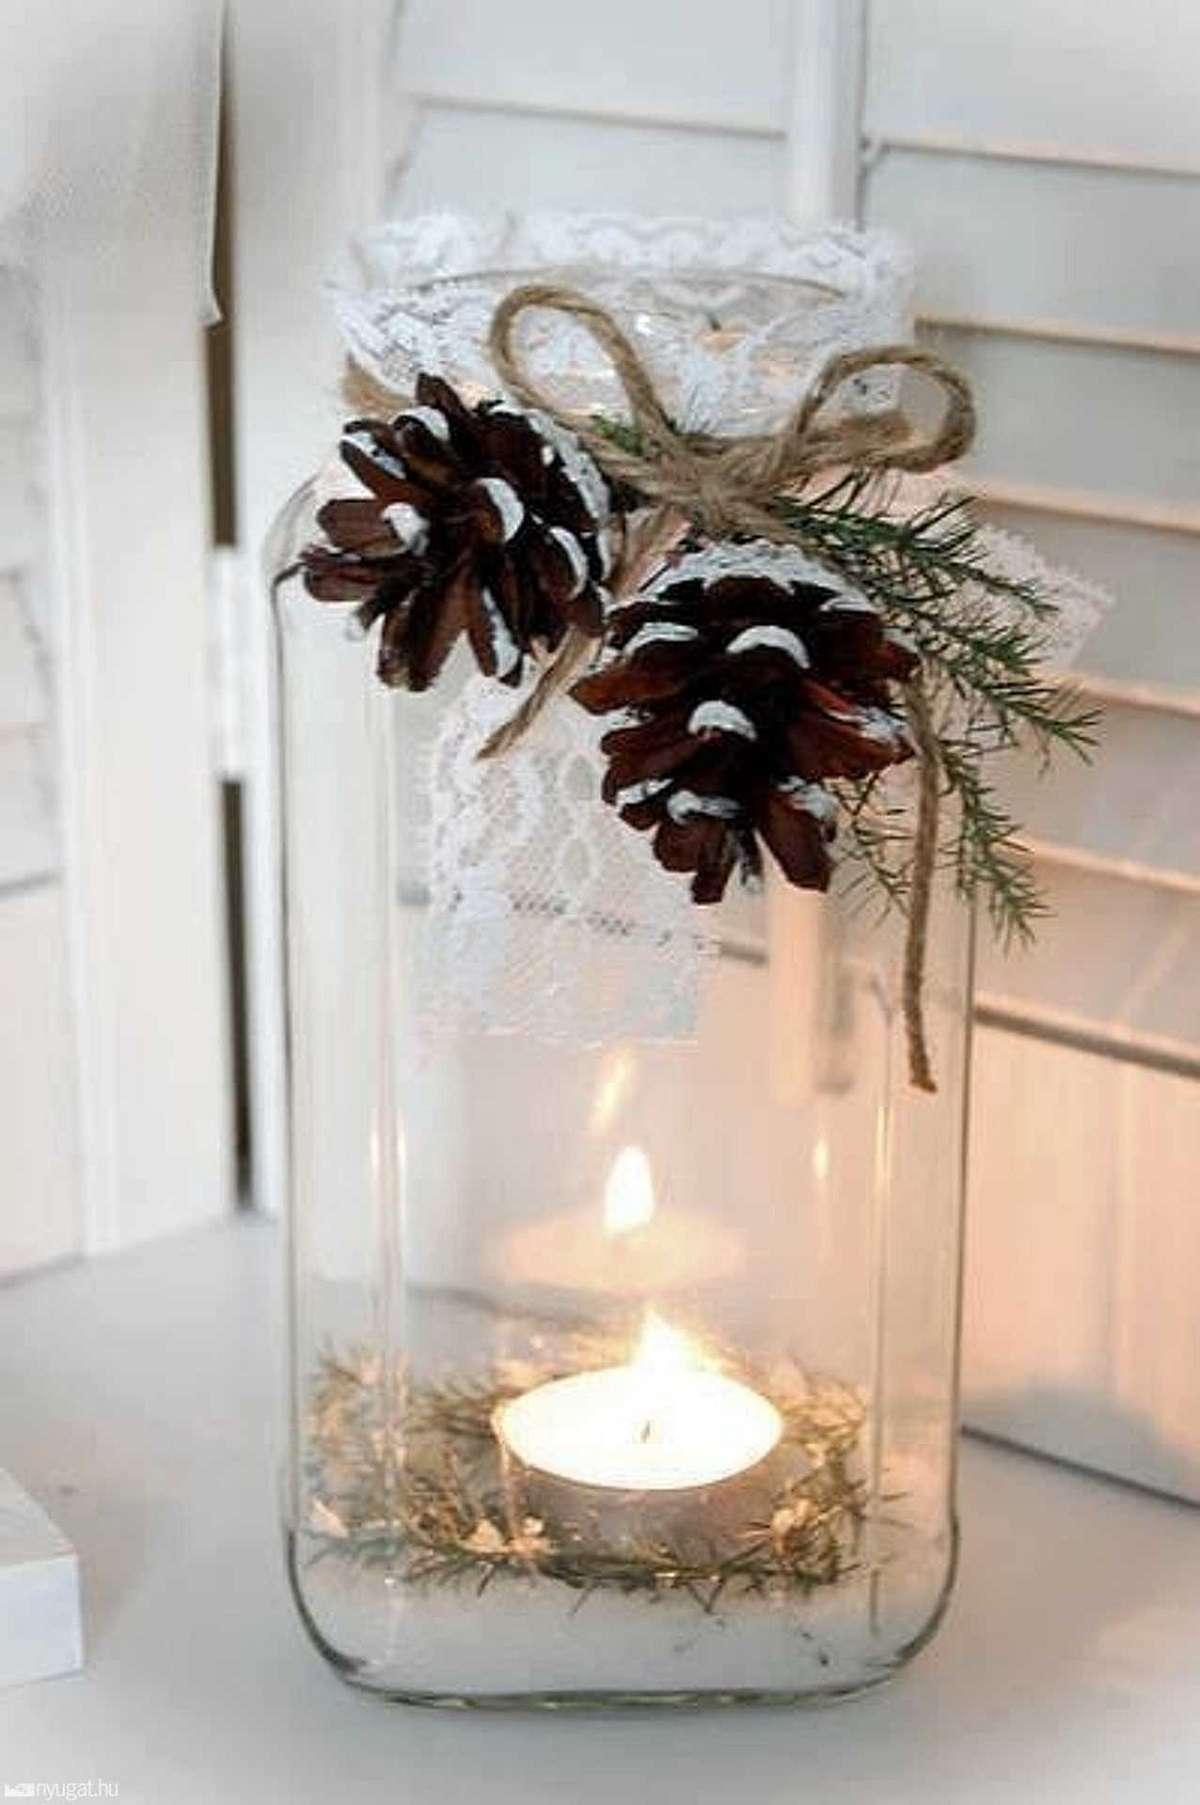 8 Manualidades navideñas de estilo nórdico 4